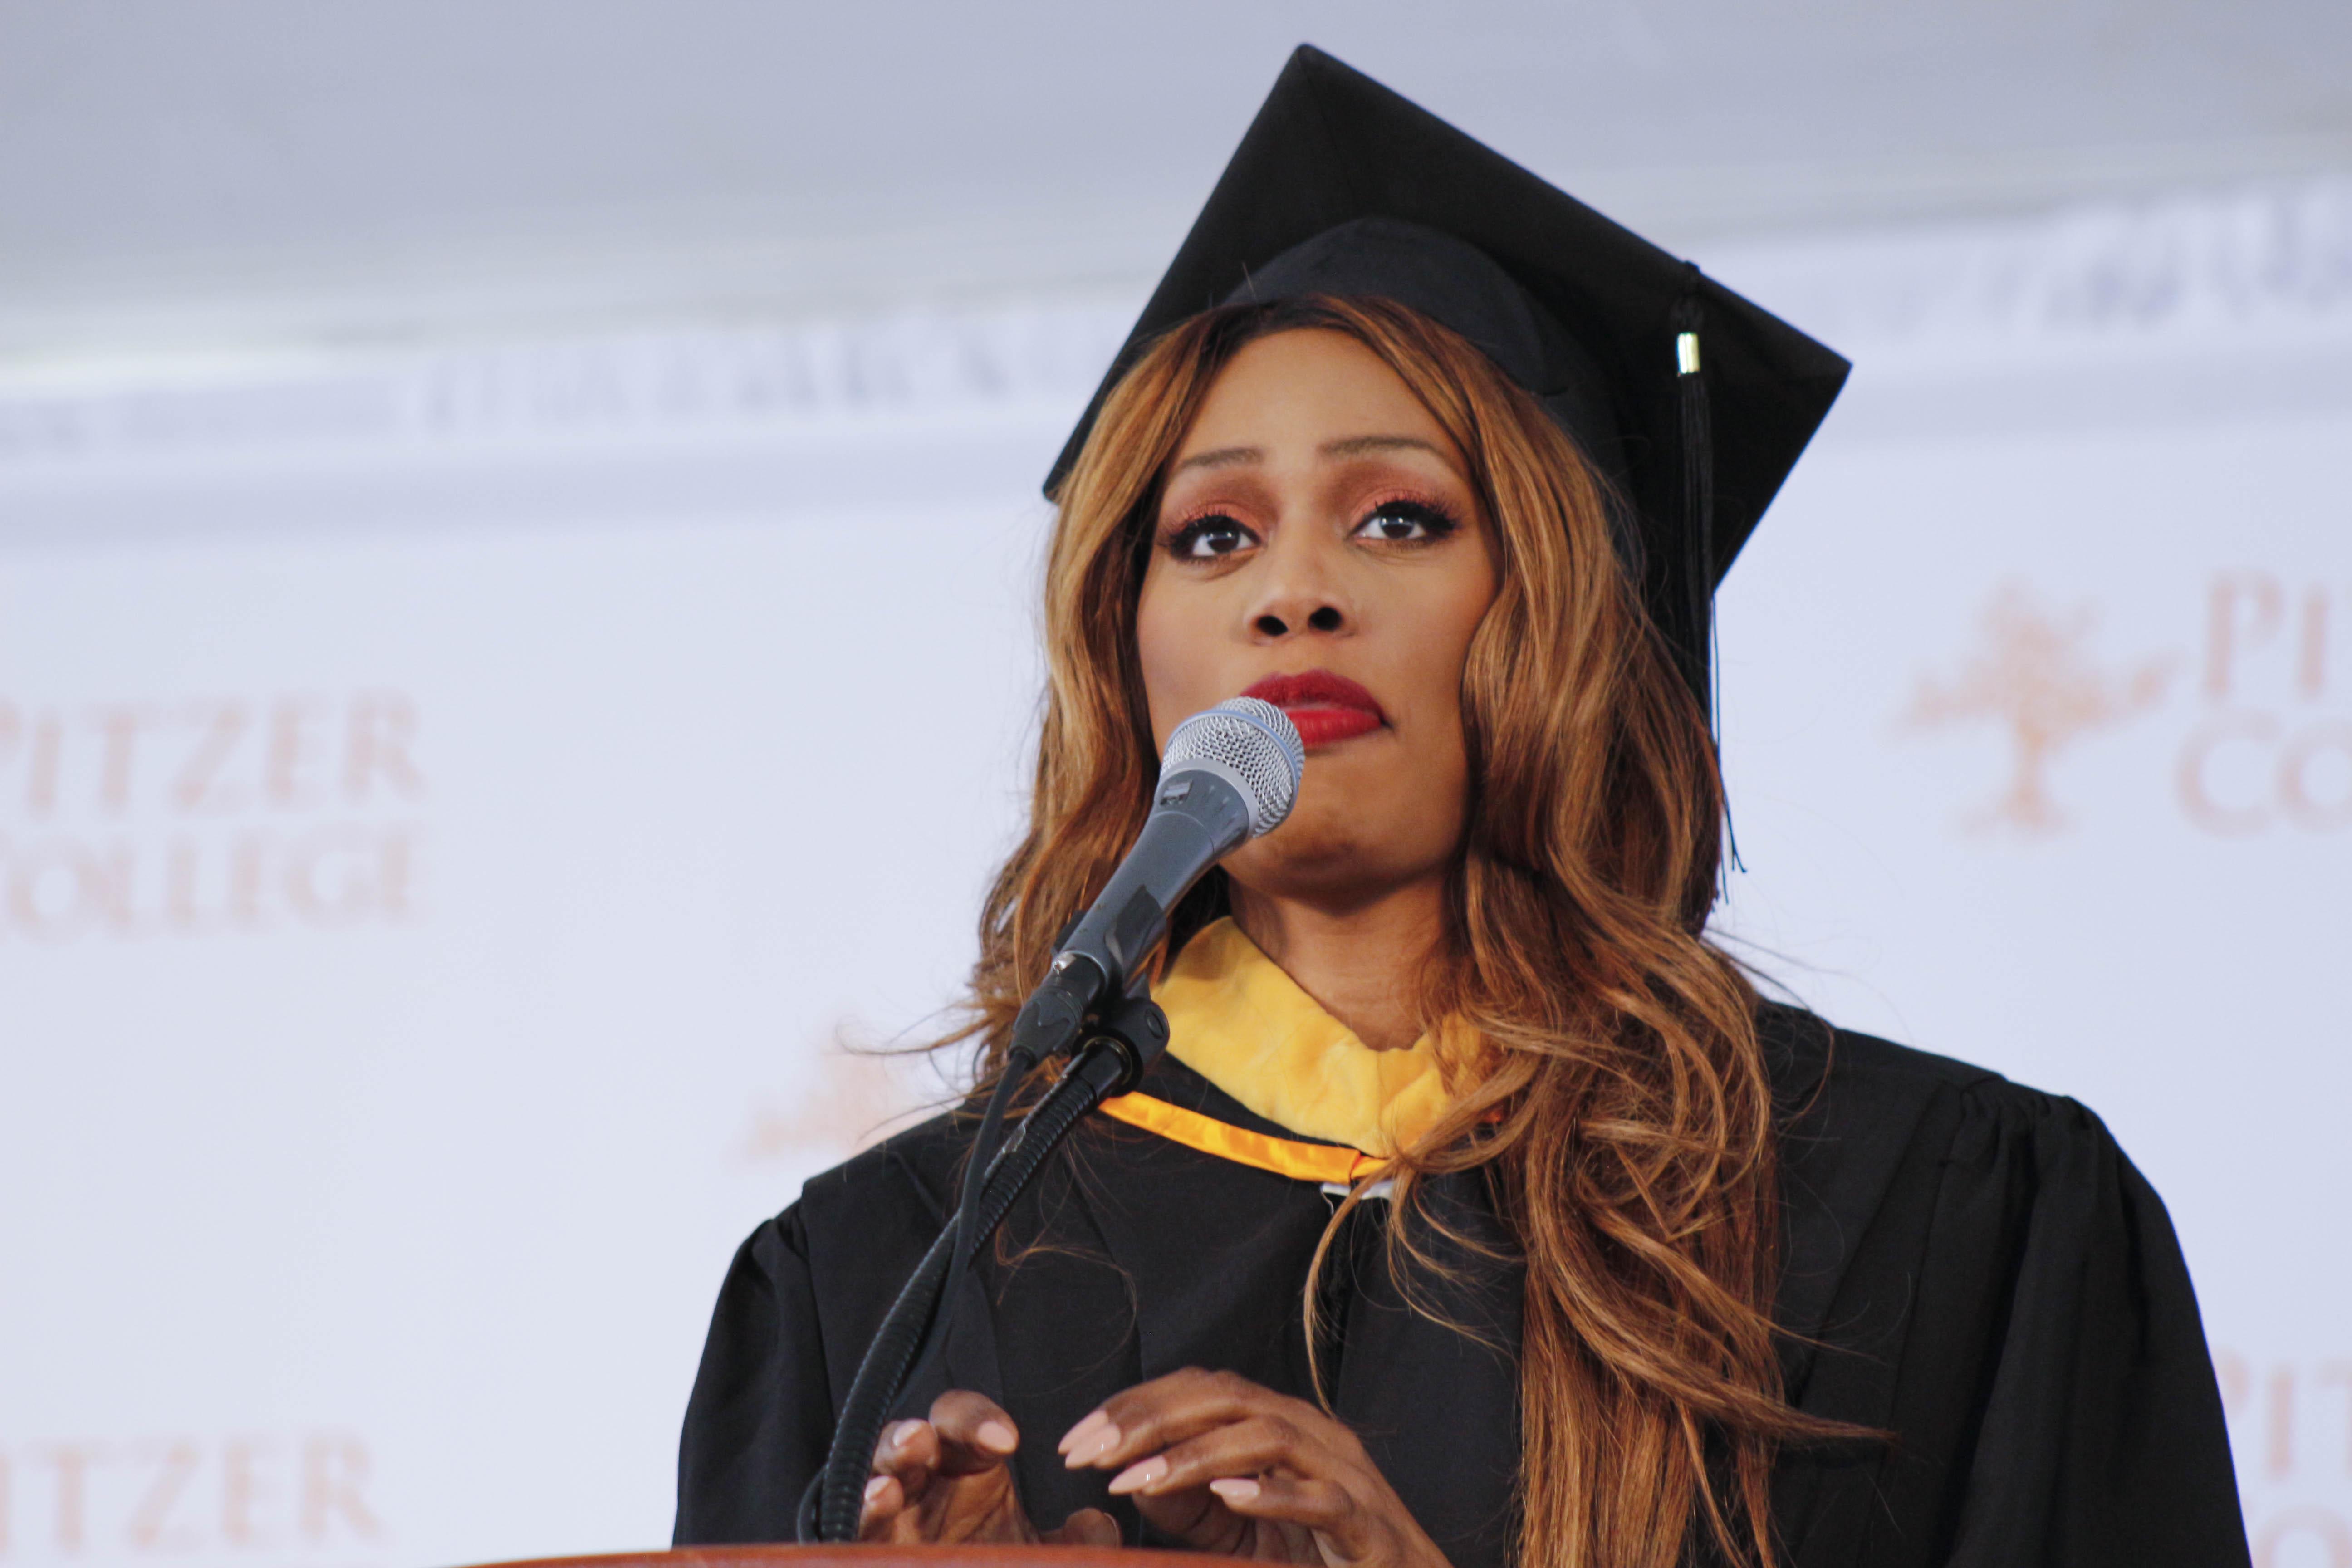 the oc taylors graduation speech